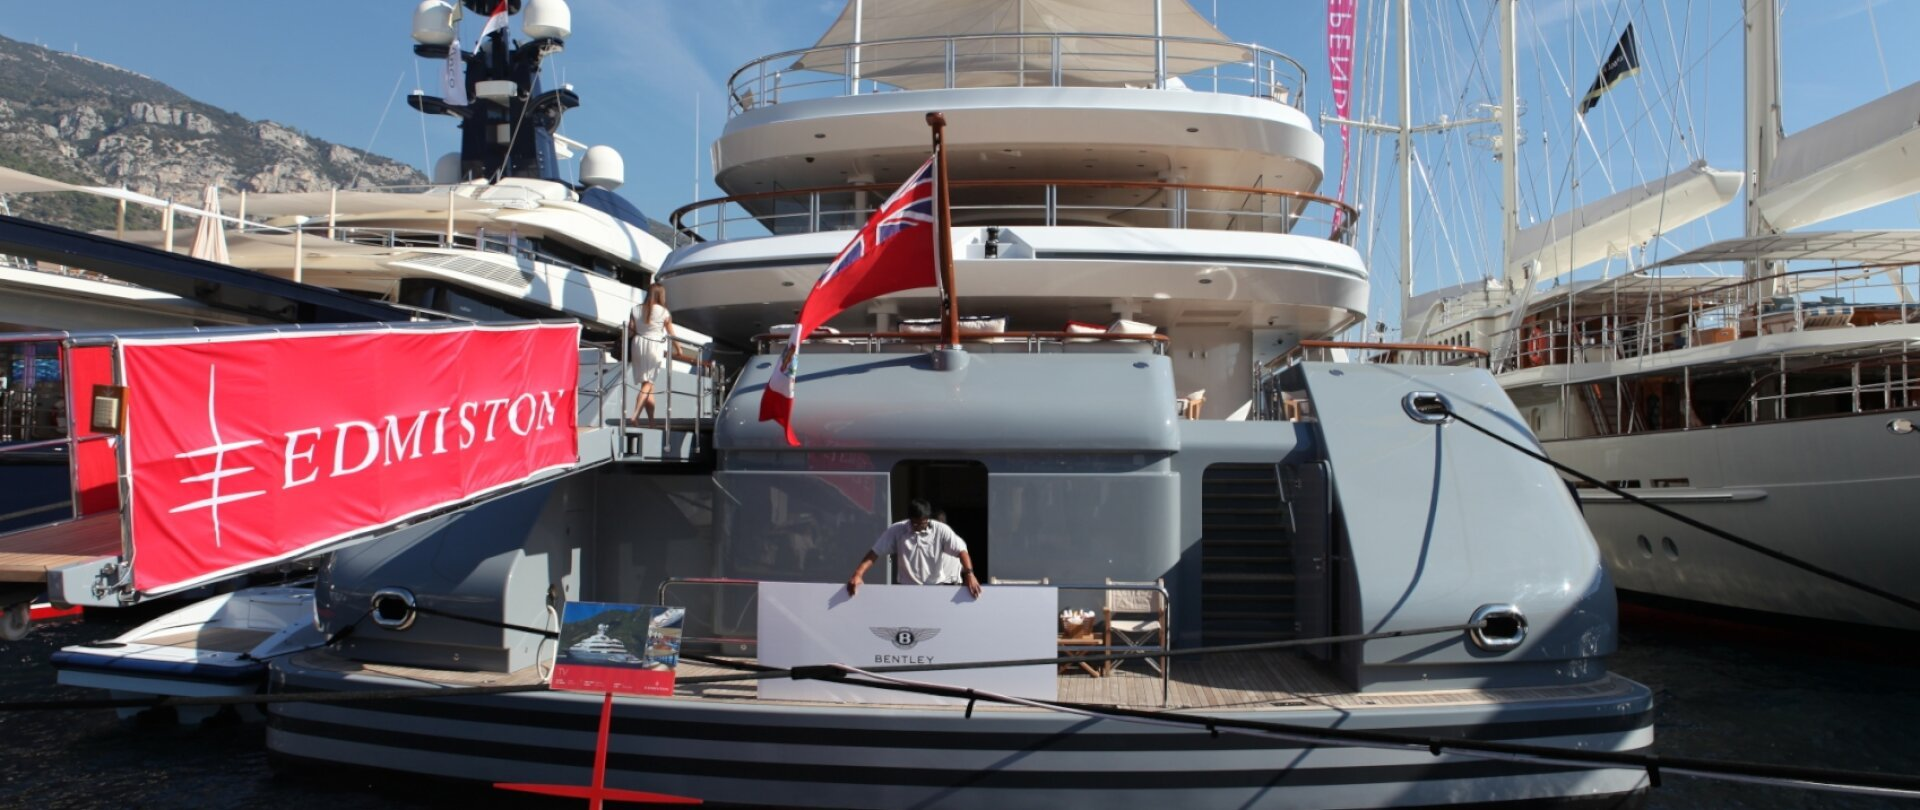 Monaco Yacht Show 2015 photo 5